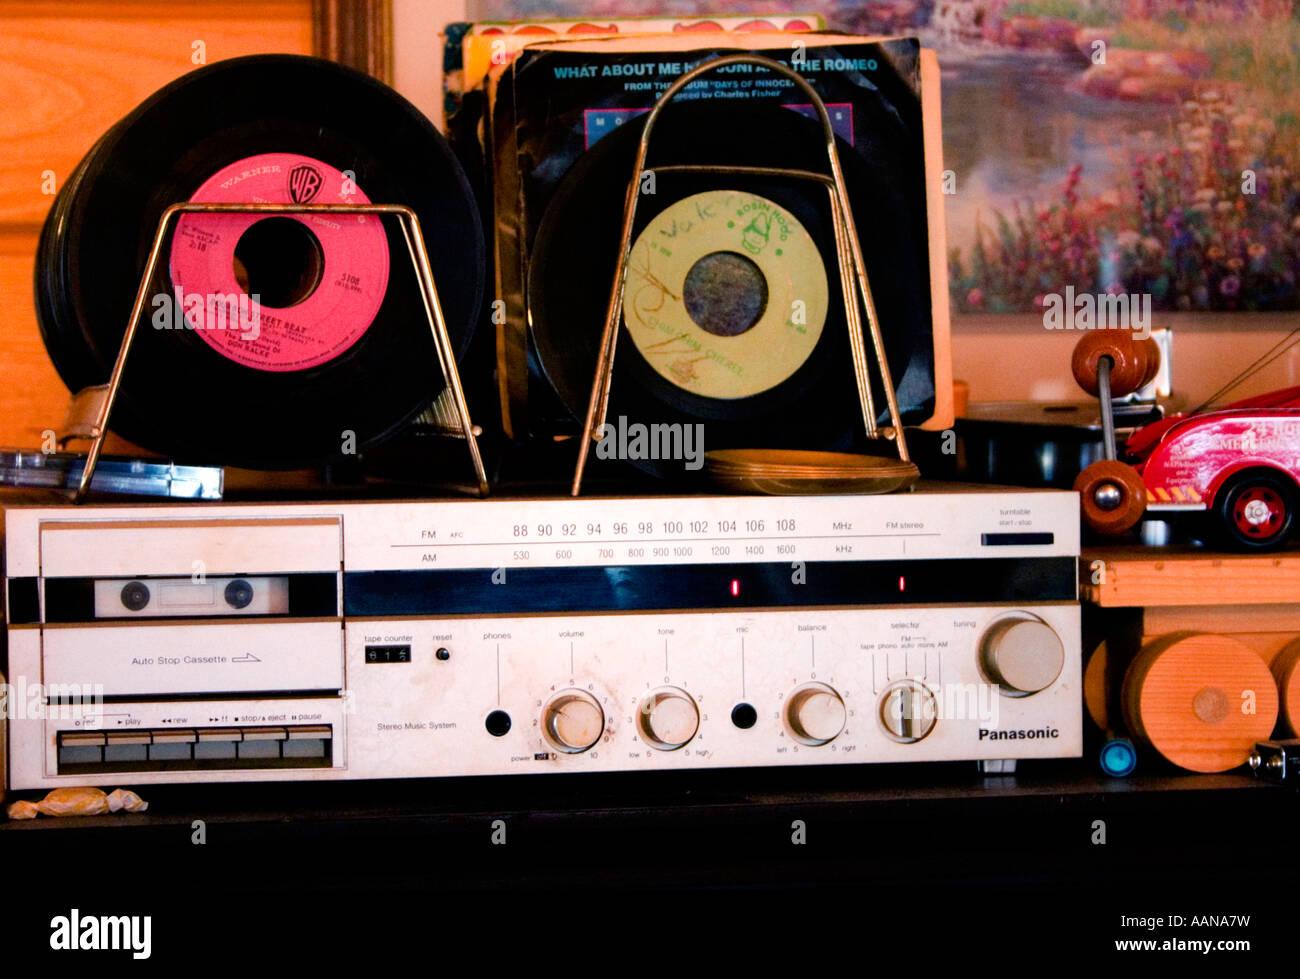 Racks of vintage 45 rpm vinyl records.  Emily Minnesota USA - Stock Image